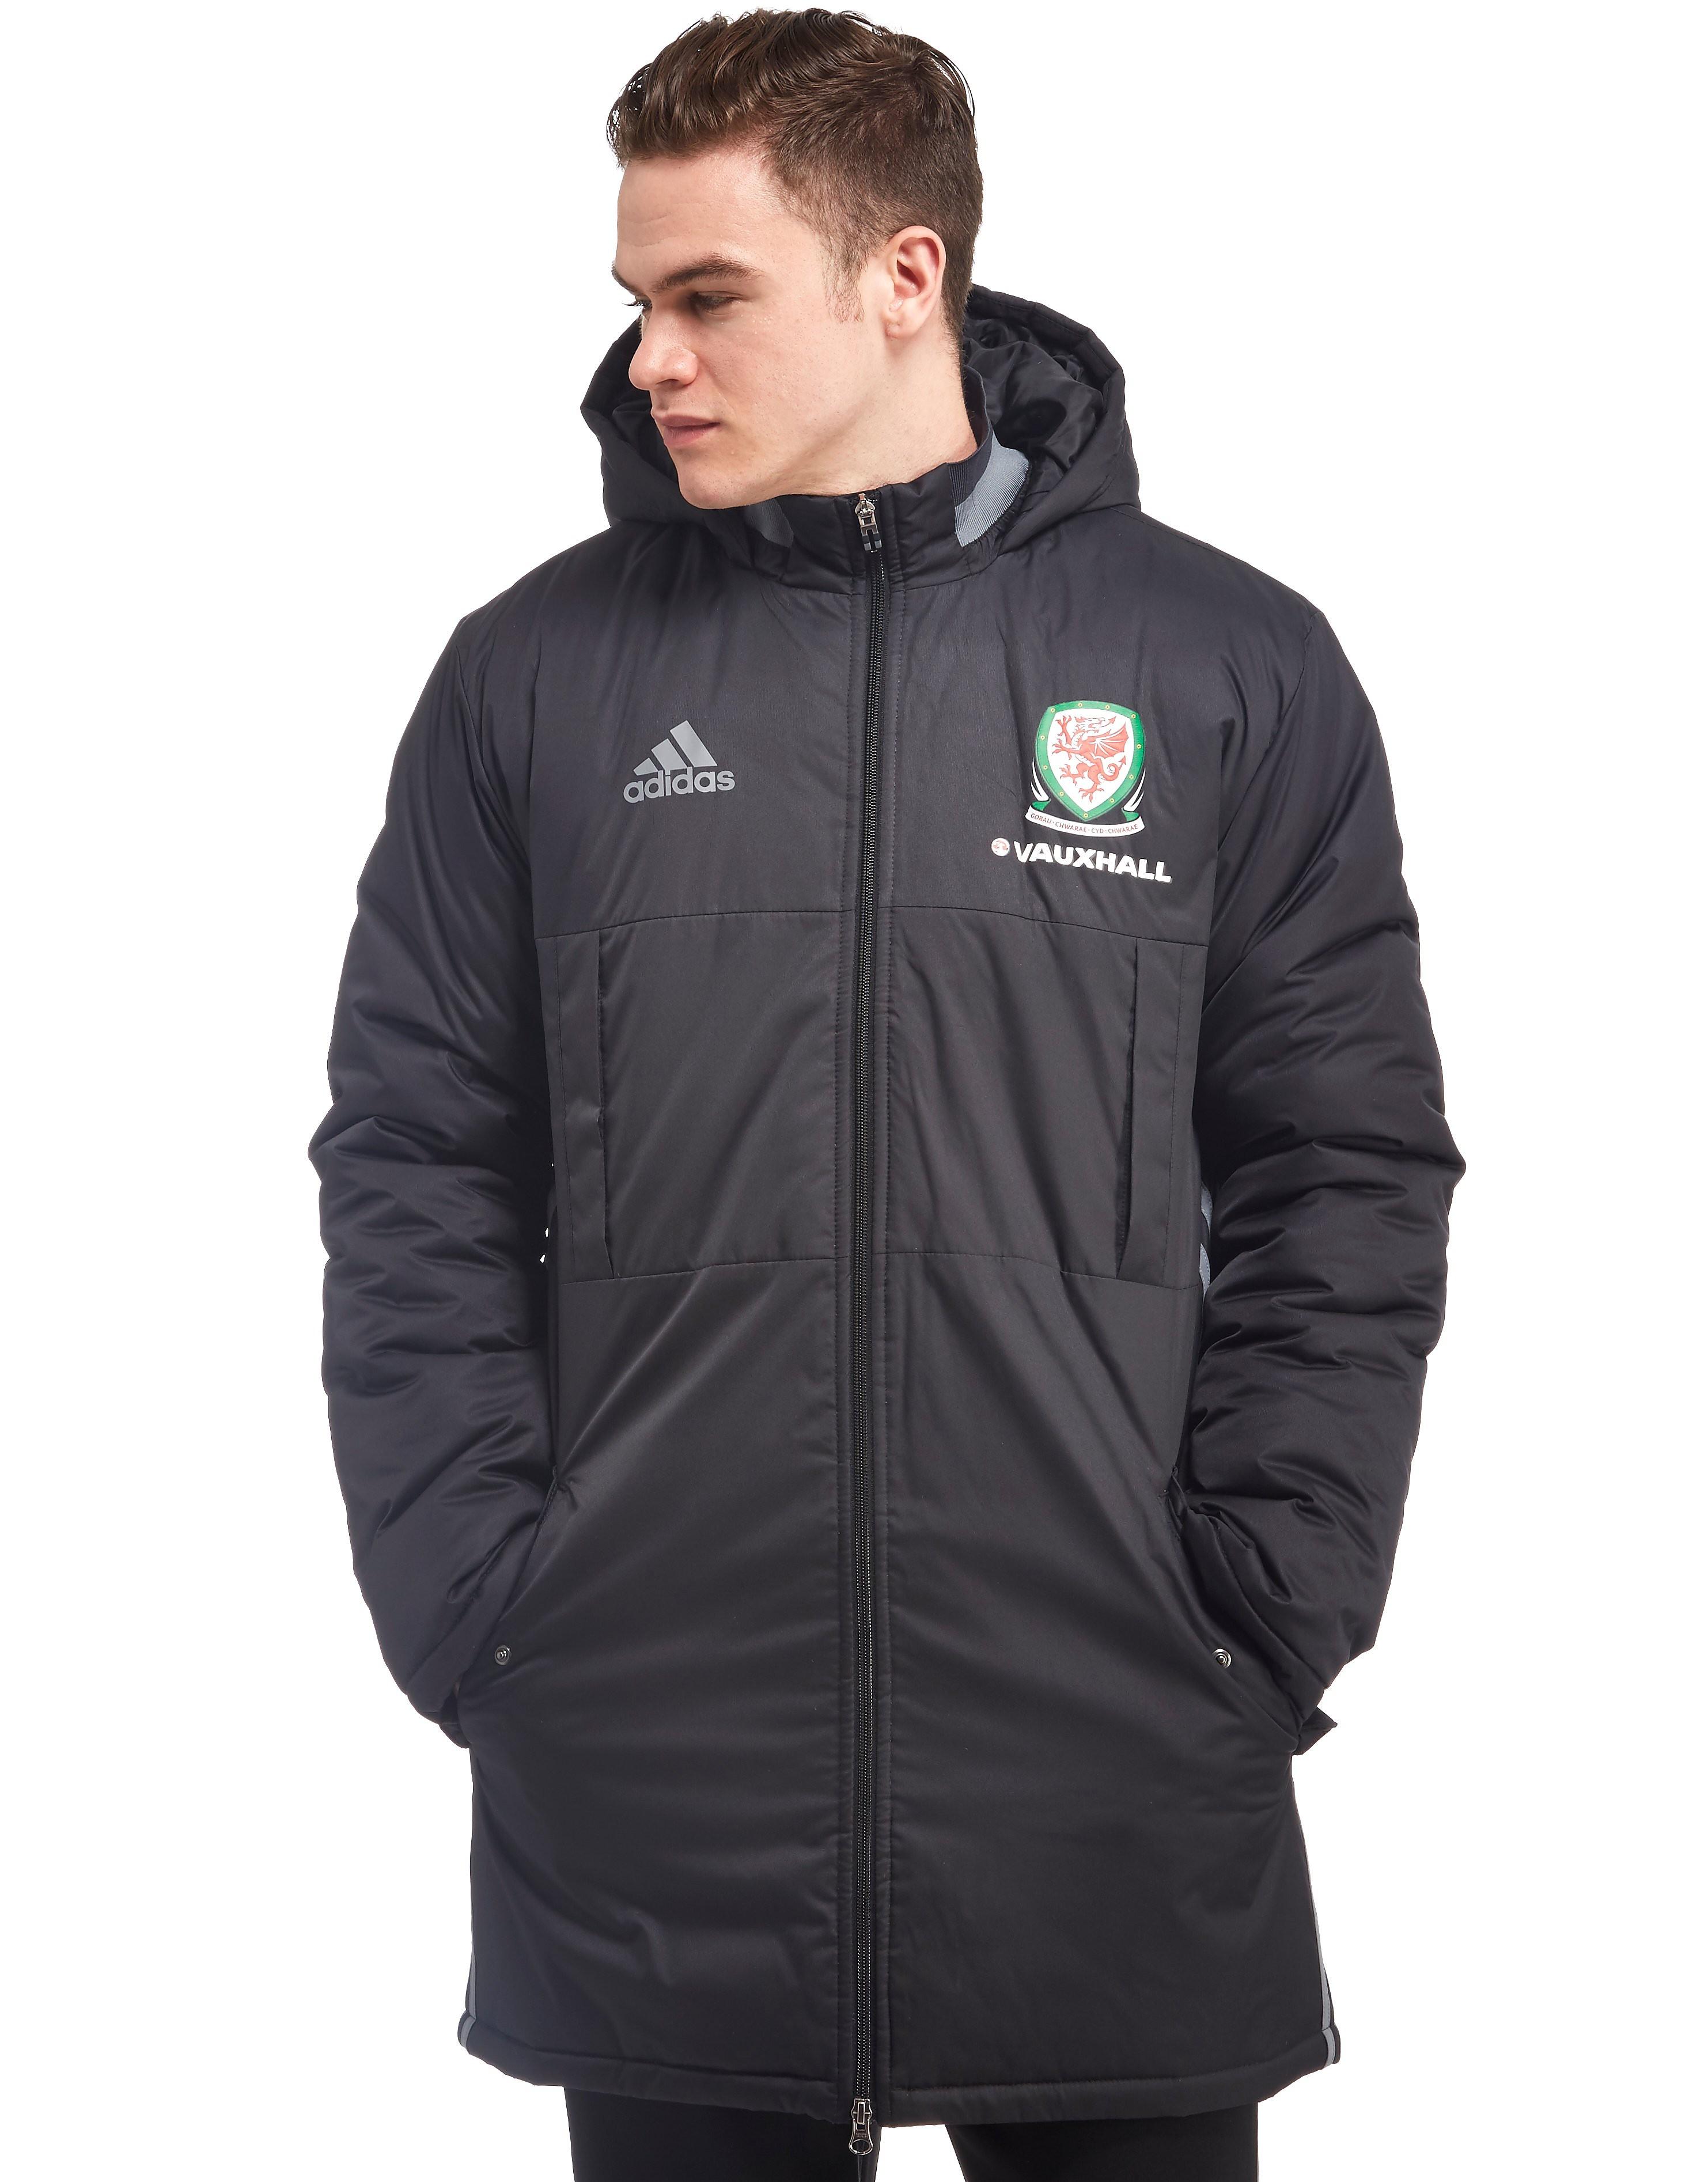 adidas Wales 2016/17 Stadium Jacket